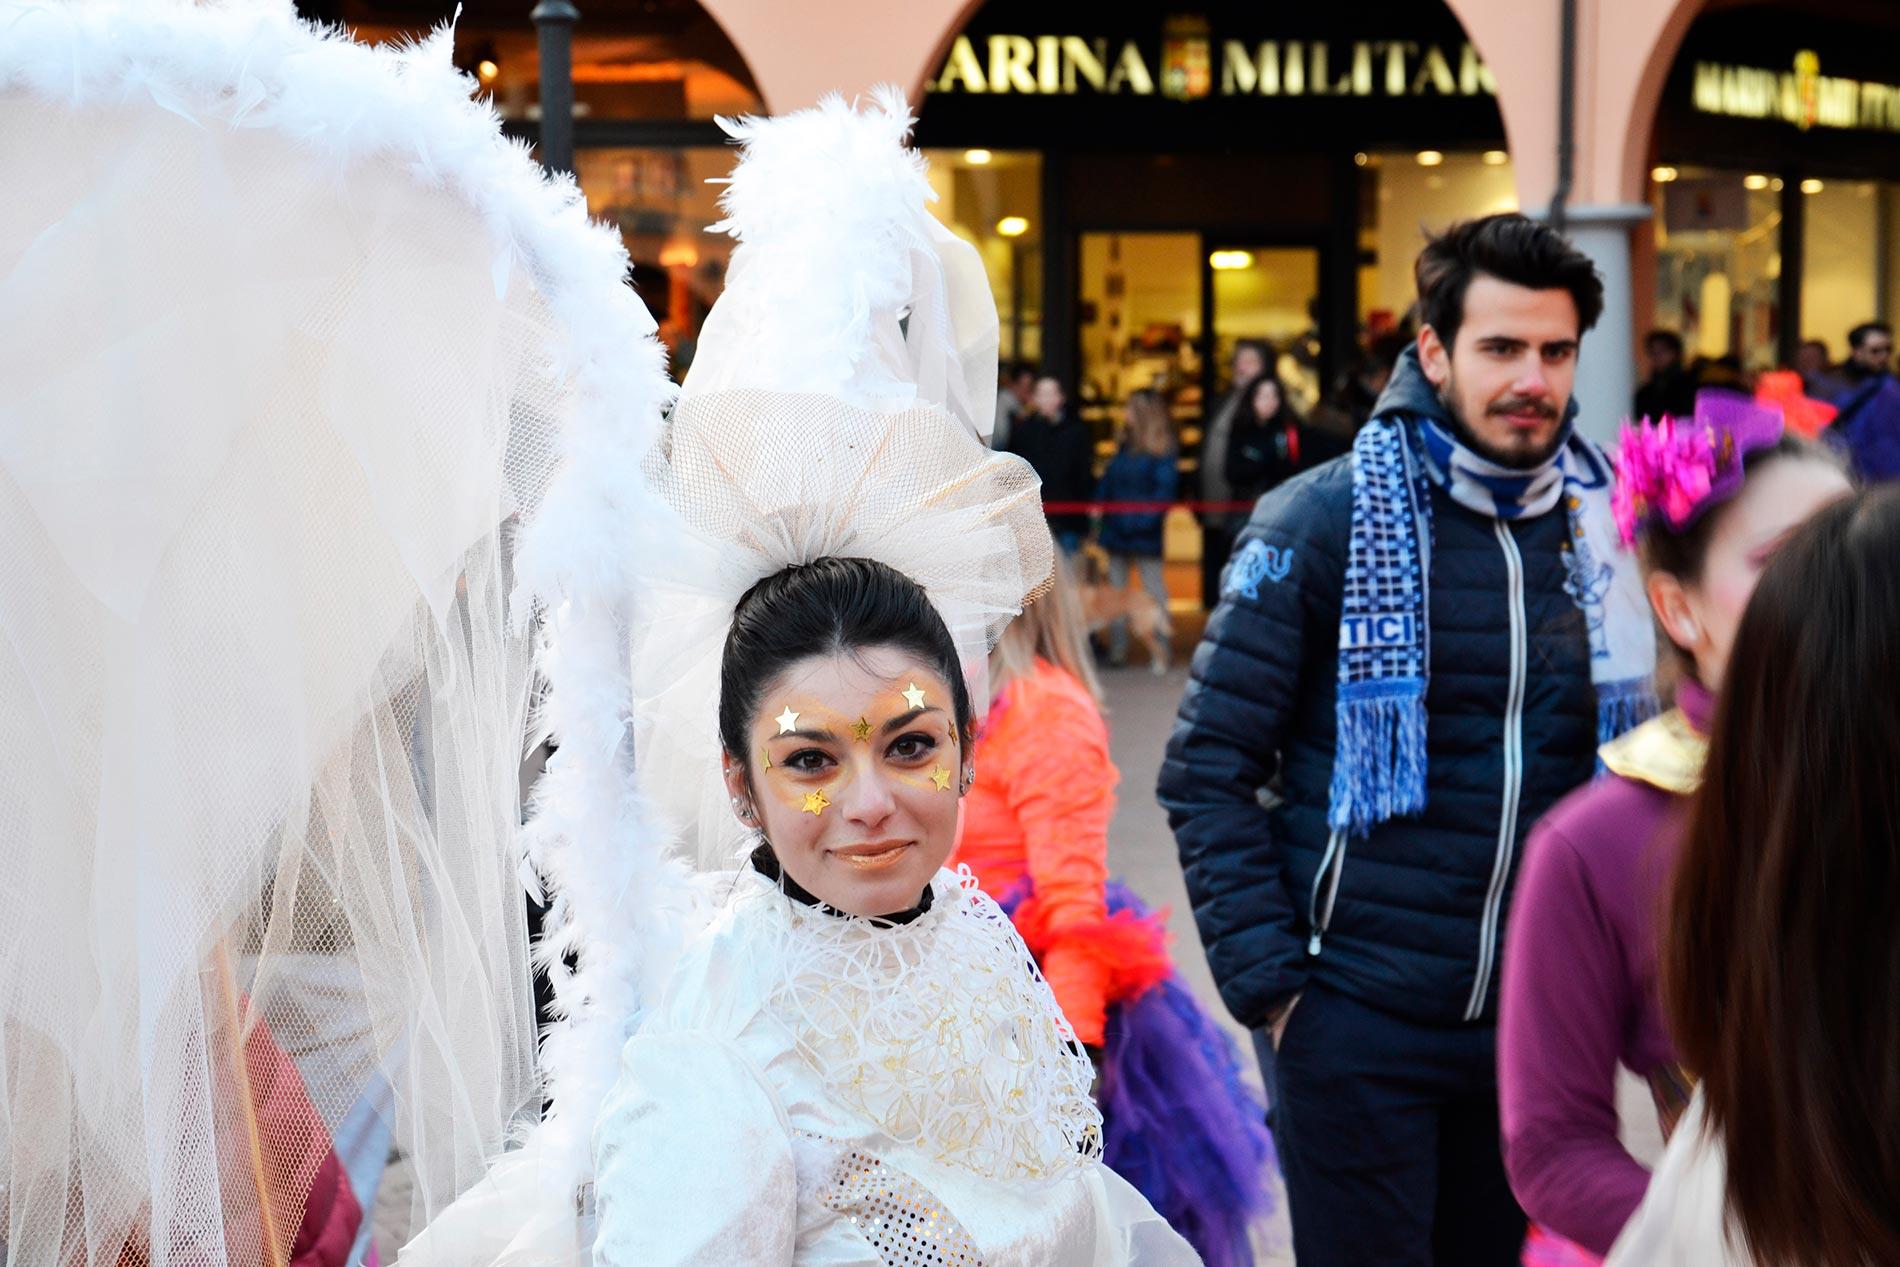 Carnevale outlet village Foaino